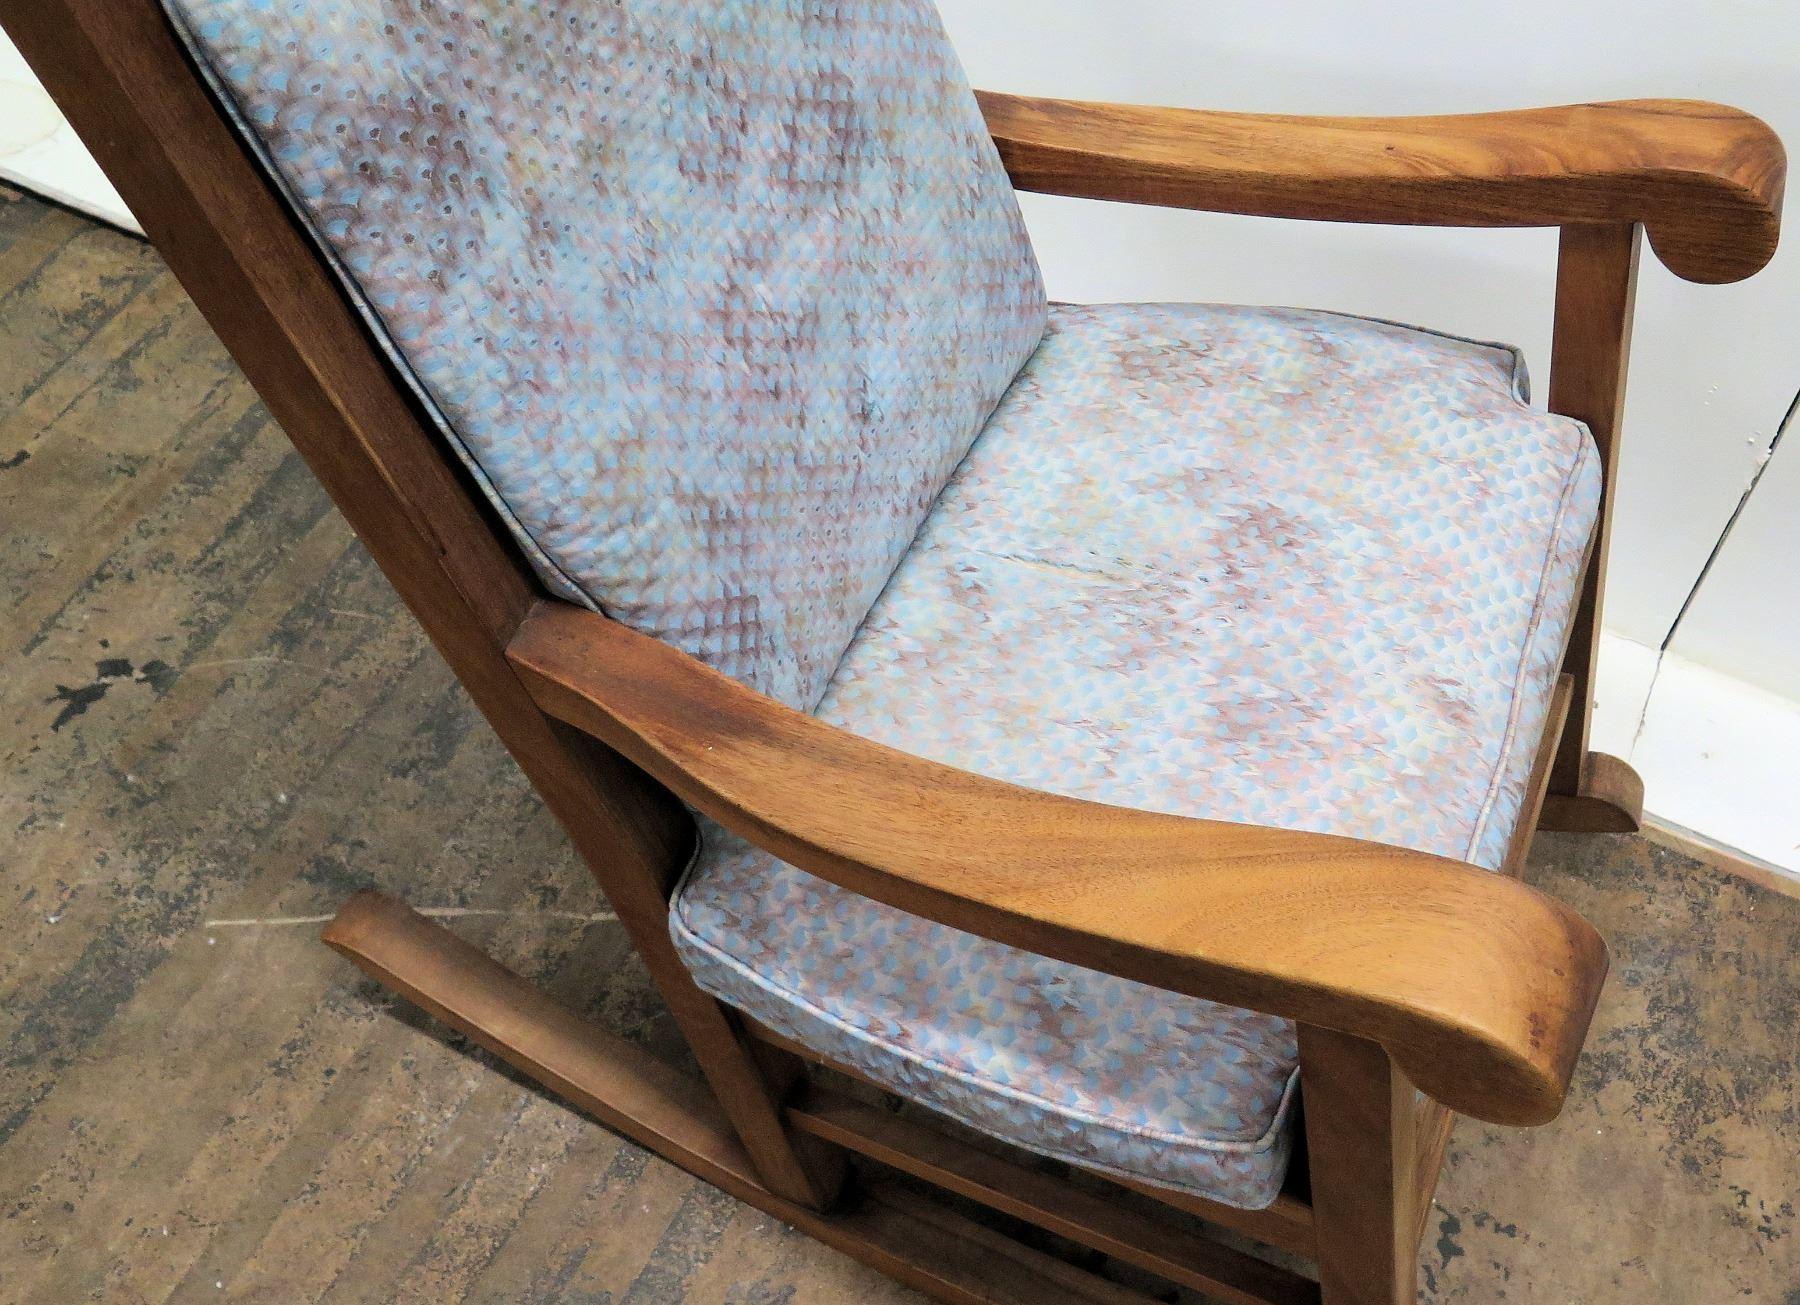 Enjoyable Koa Wood Rocking Chair W Scroll Armrests By Martin Machost Co Dining Chair Design Ideas Machostcouk